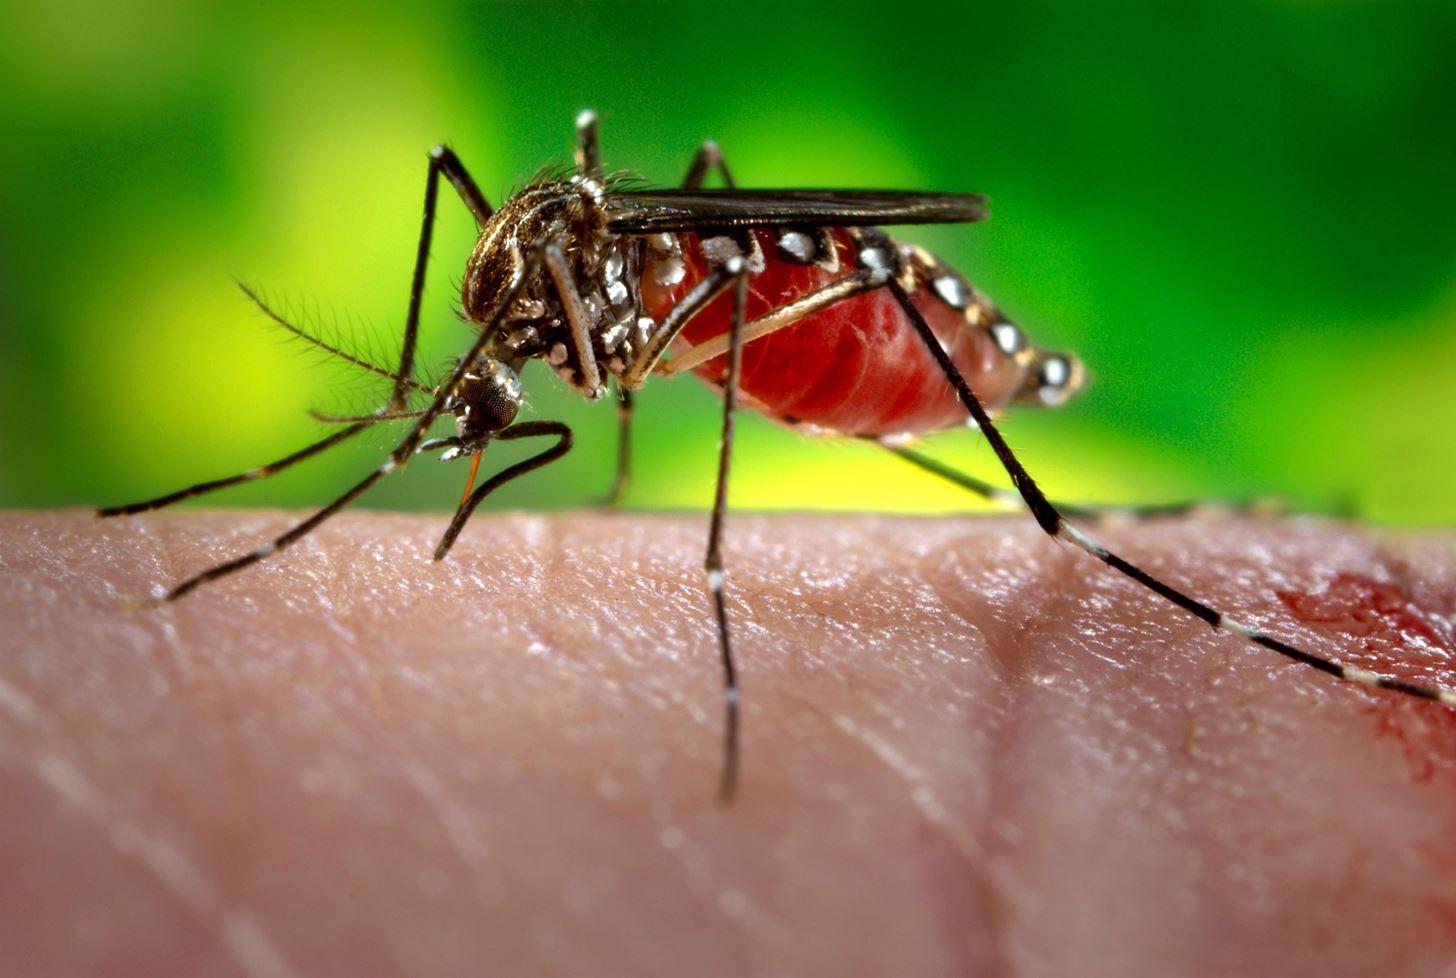 Blood Test Can Predict Severe Dengue Complications, Saving Kids' Lives